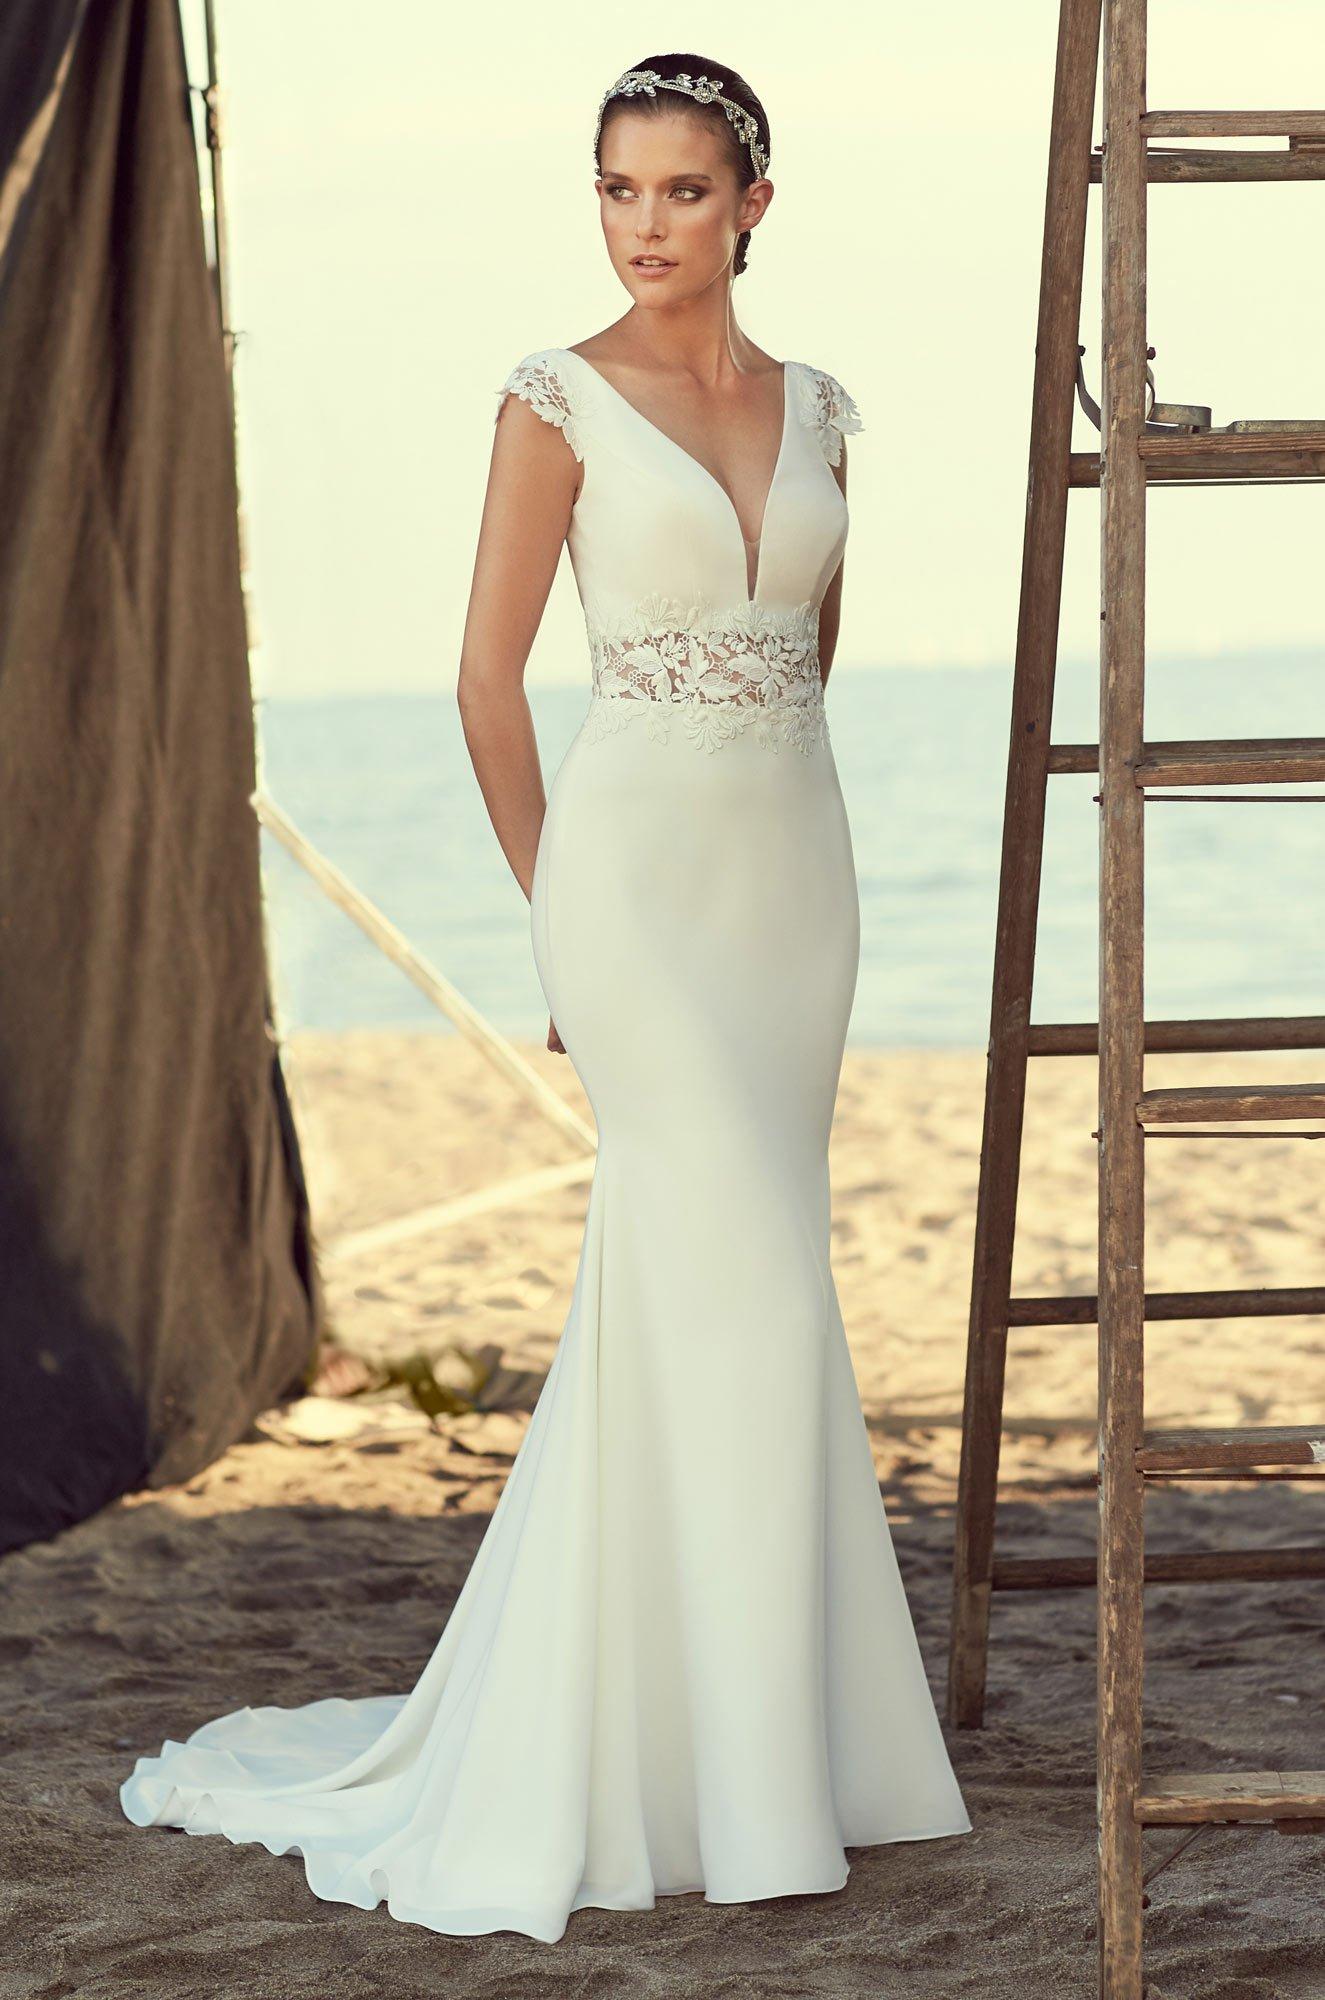 Sheer Midriff Wedding Dress - Style #2181 | Mikaella Bridal